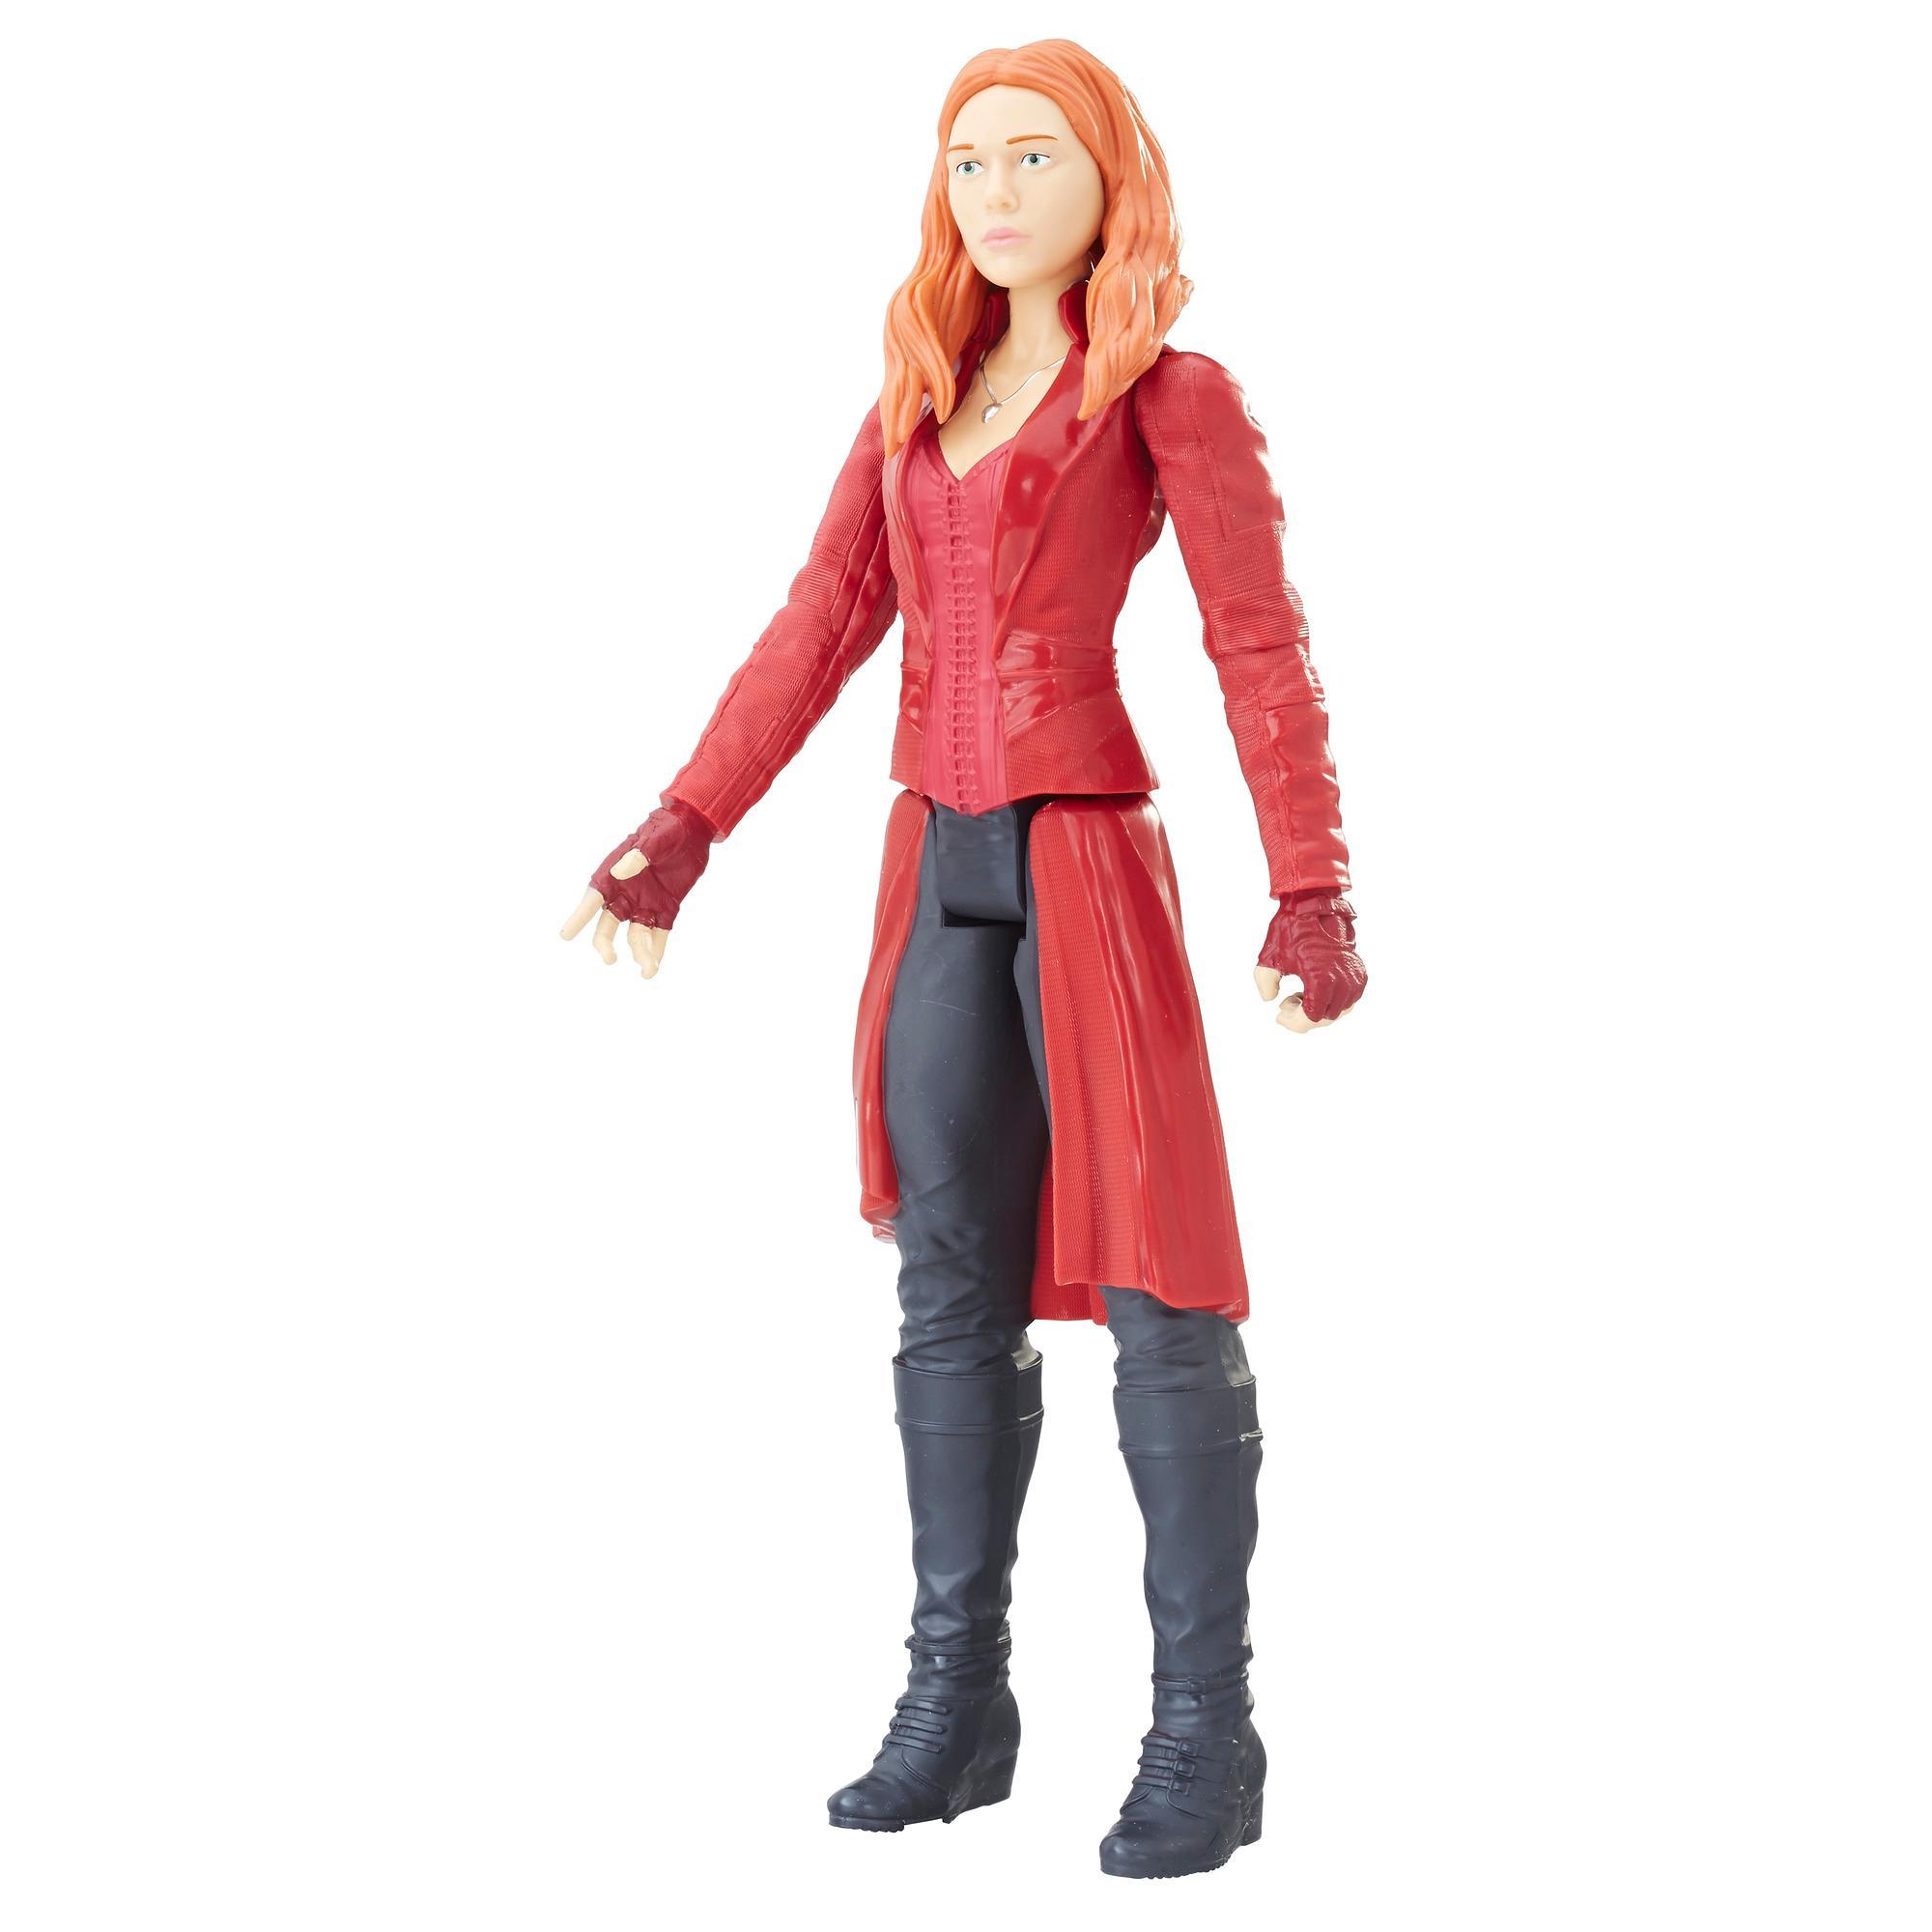 Marvel Infinity War Titan Hero Series - Scarlet Witch con puerto para Titan Hero Power FX